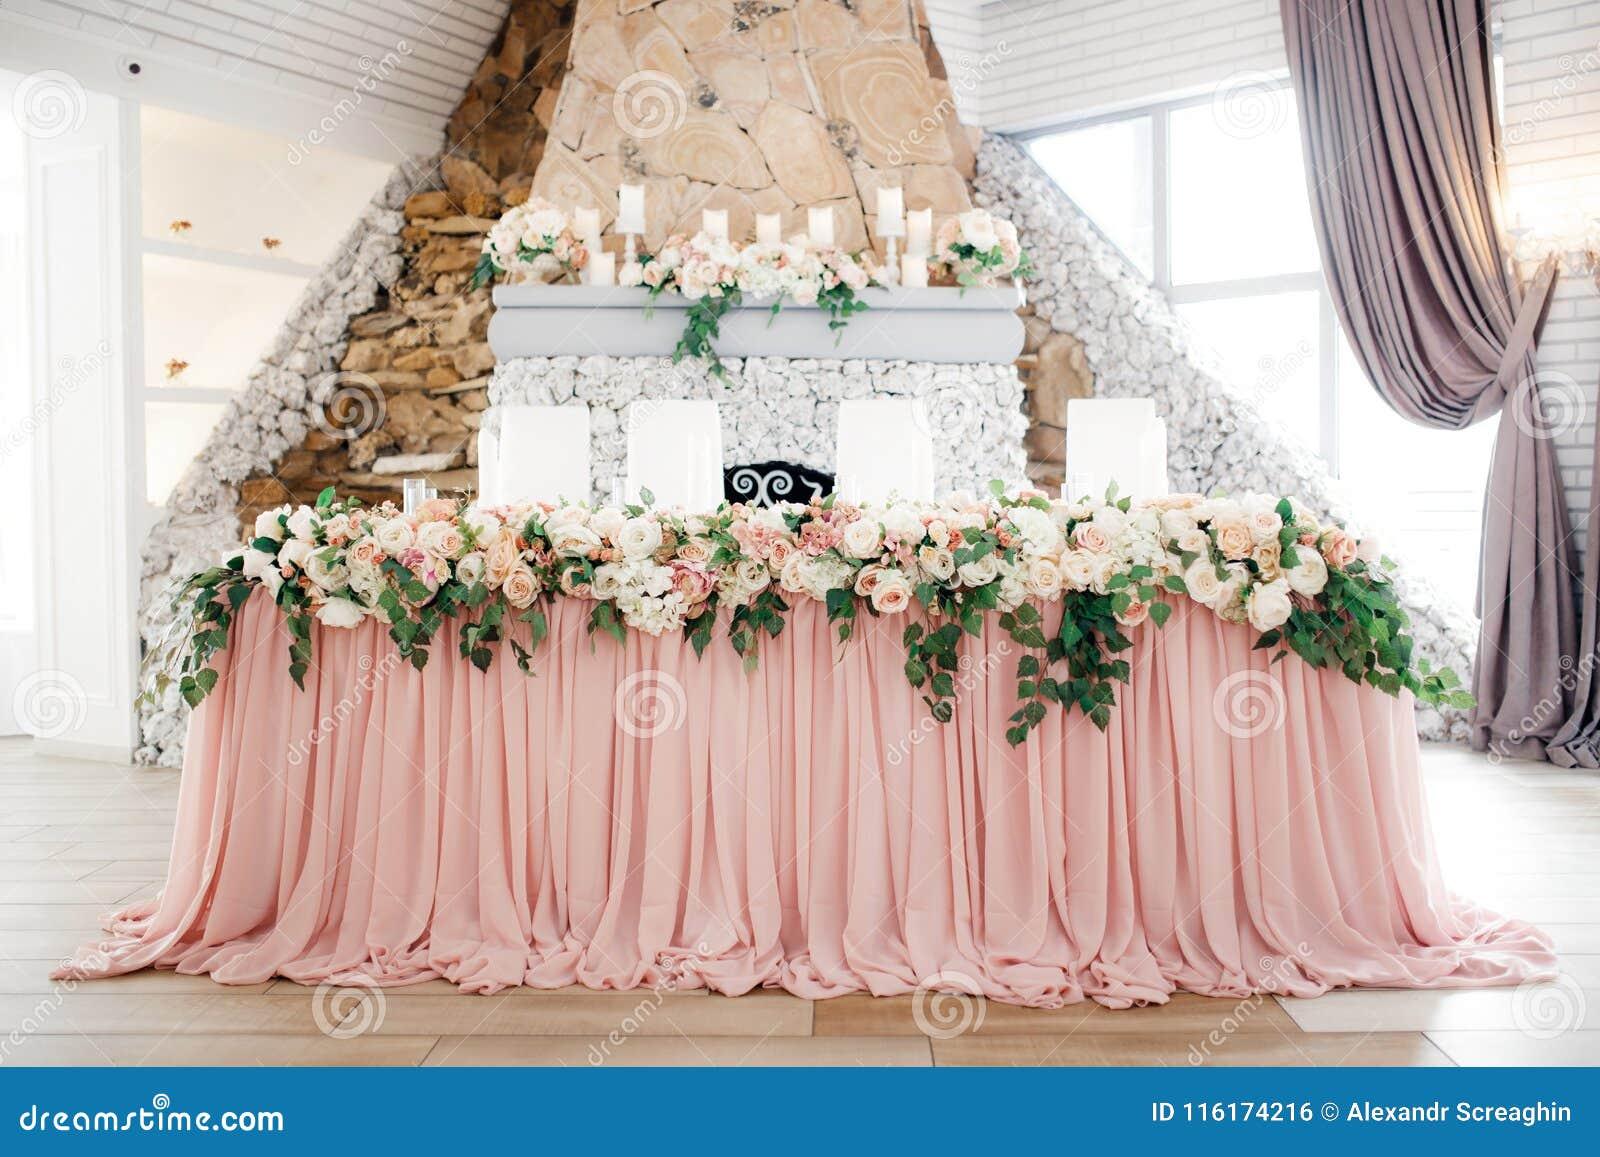 Beautiful wedding decoration set up with flowers.